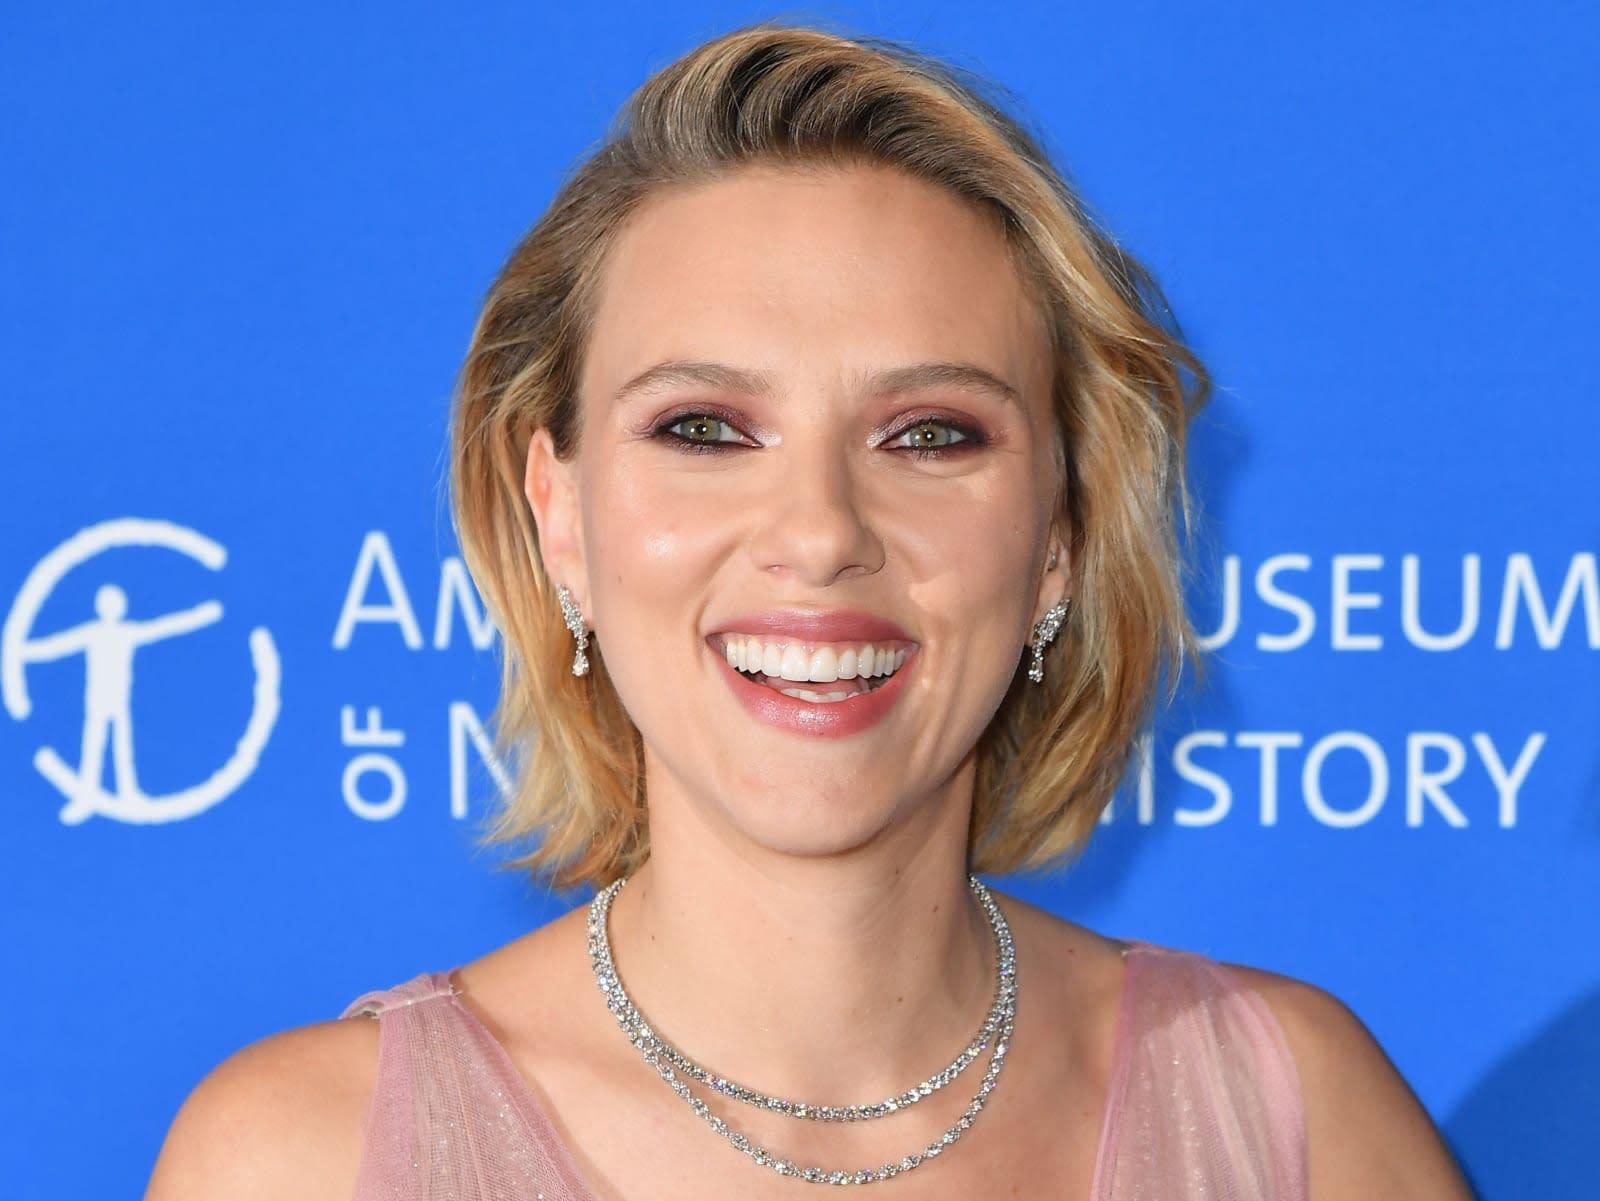 Scarlett Johansson Deepfake